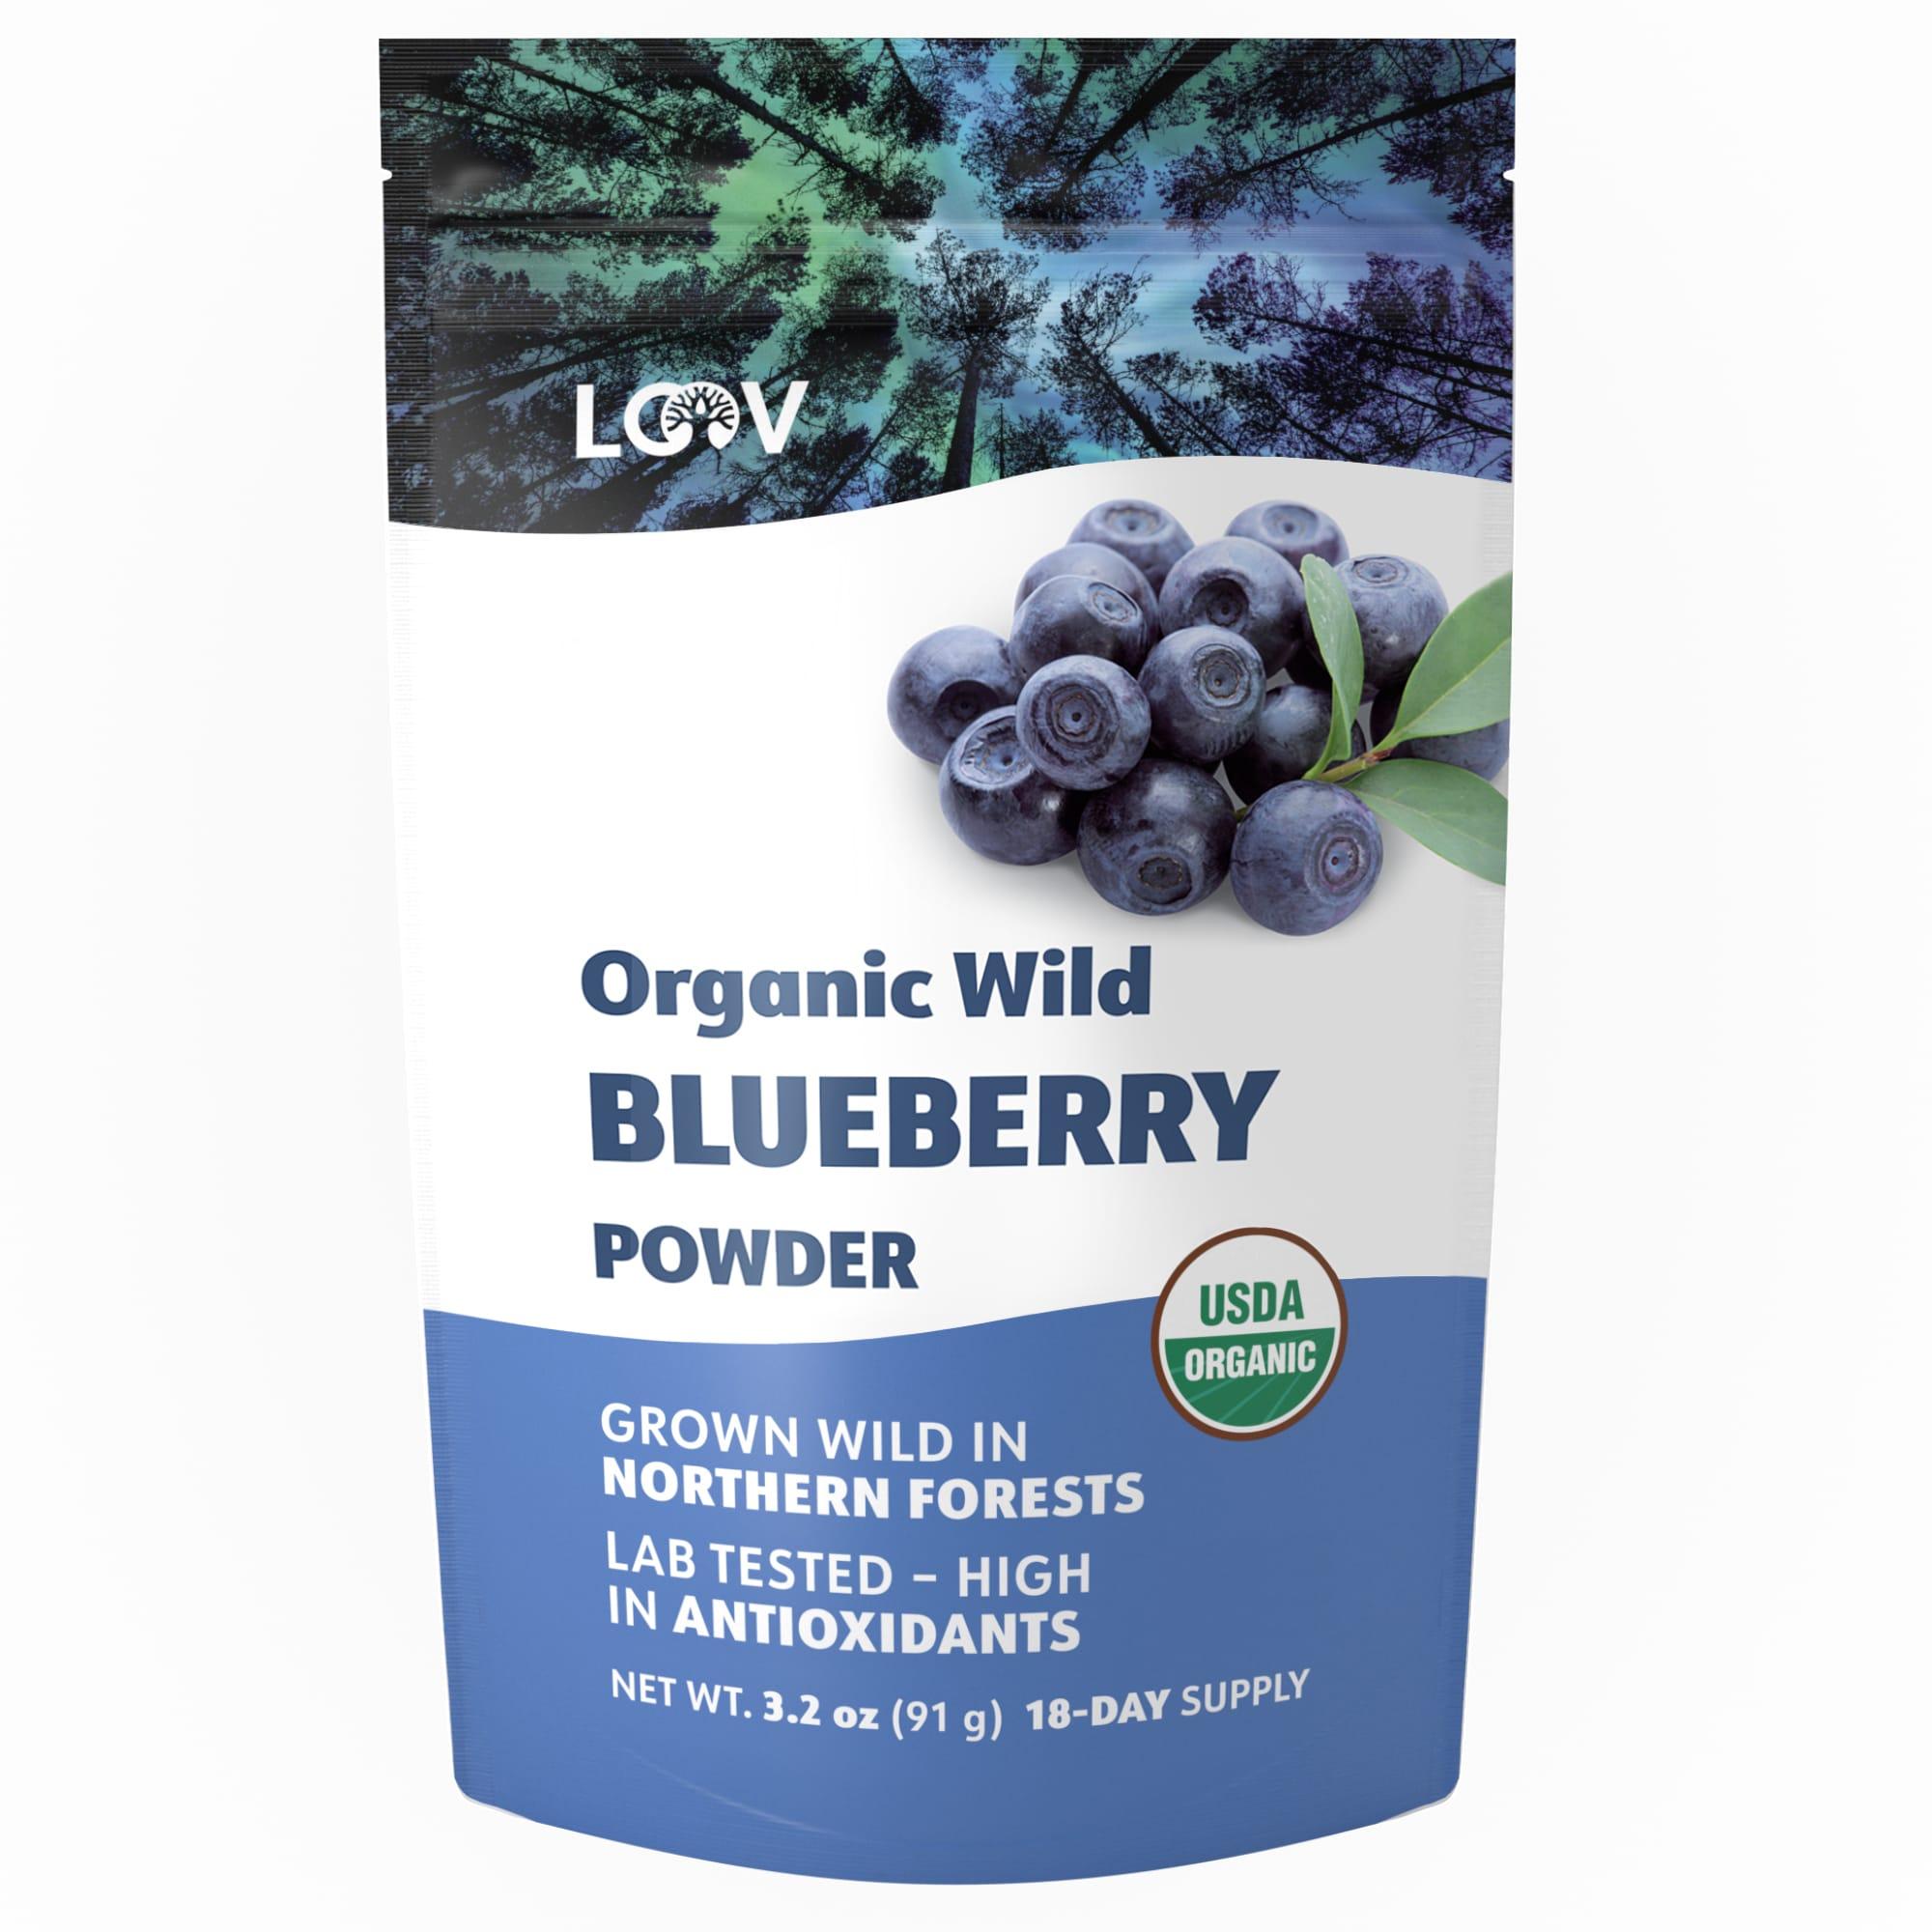 3.2 oz Dried organic Wild Blueberries